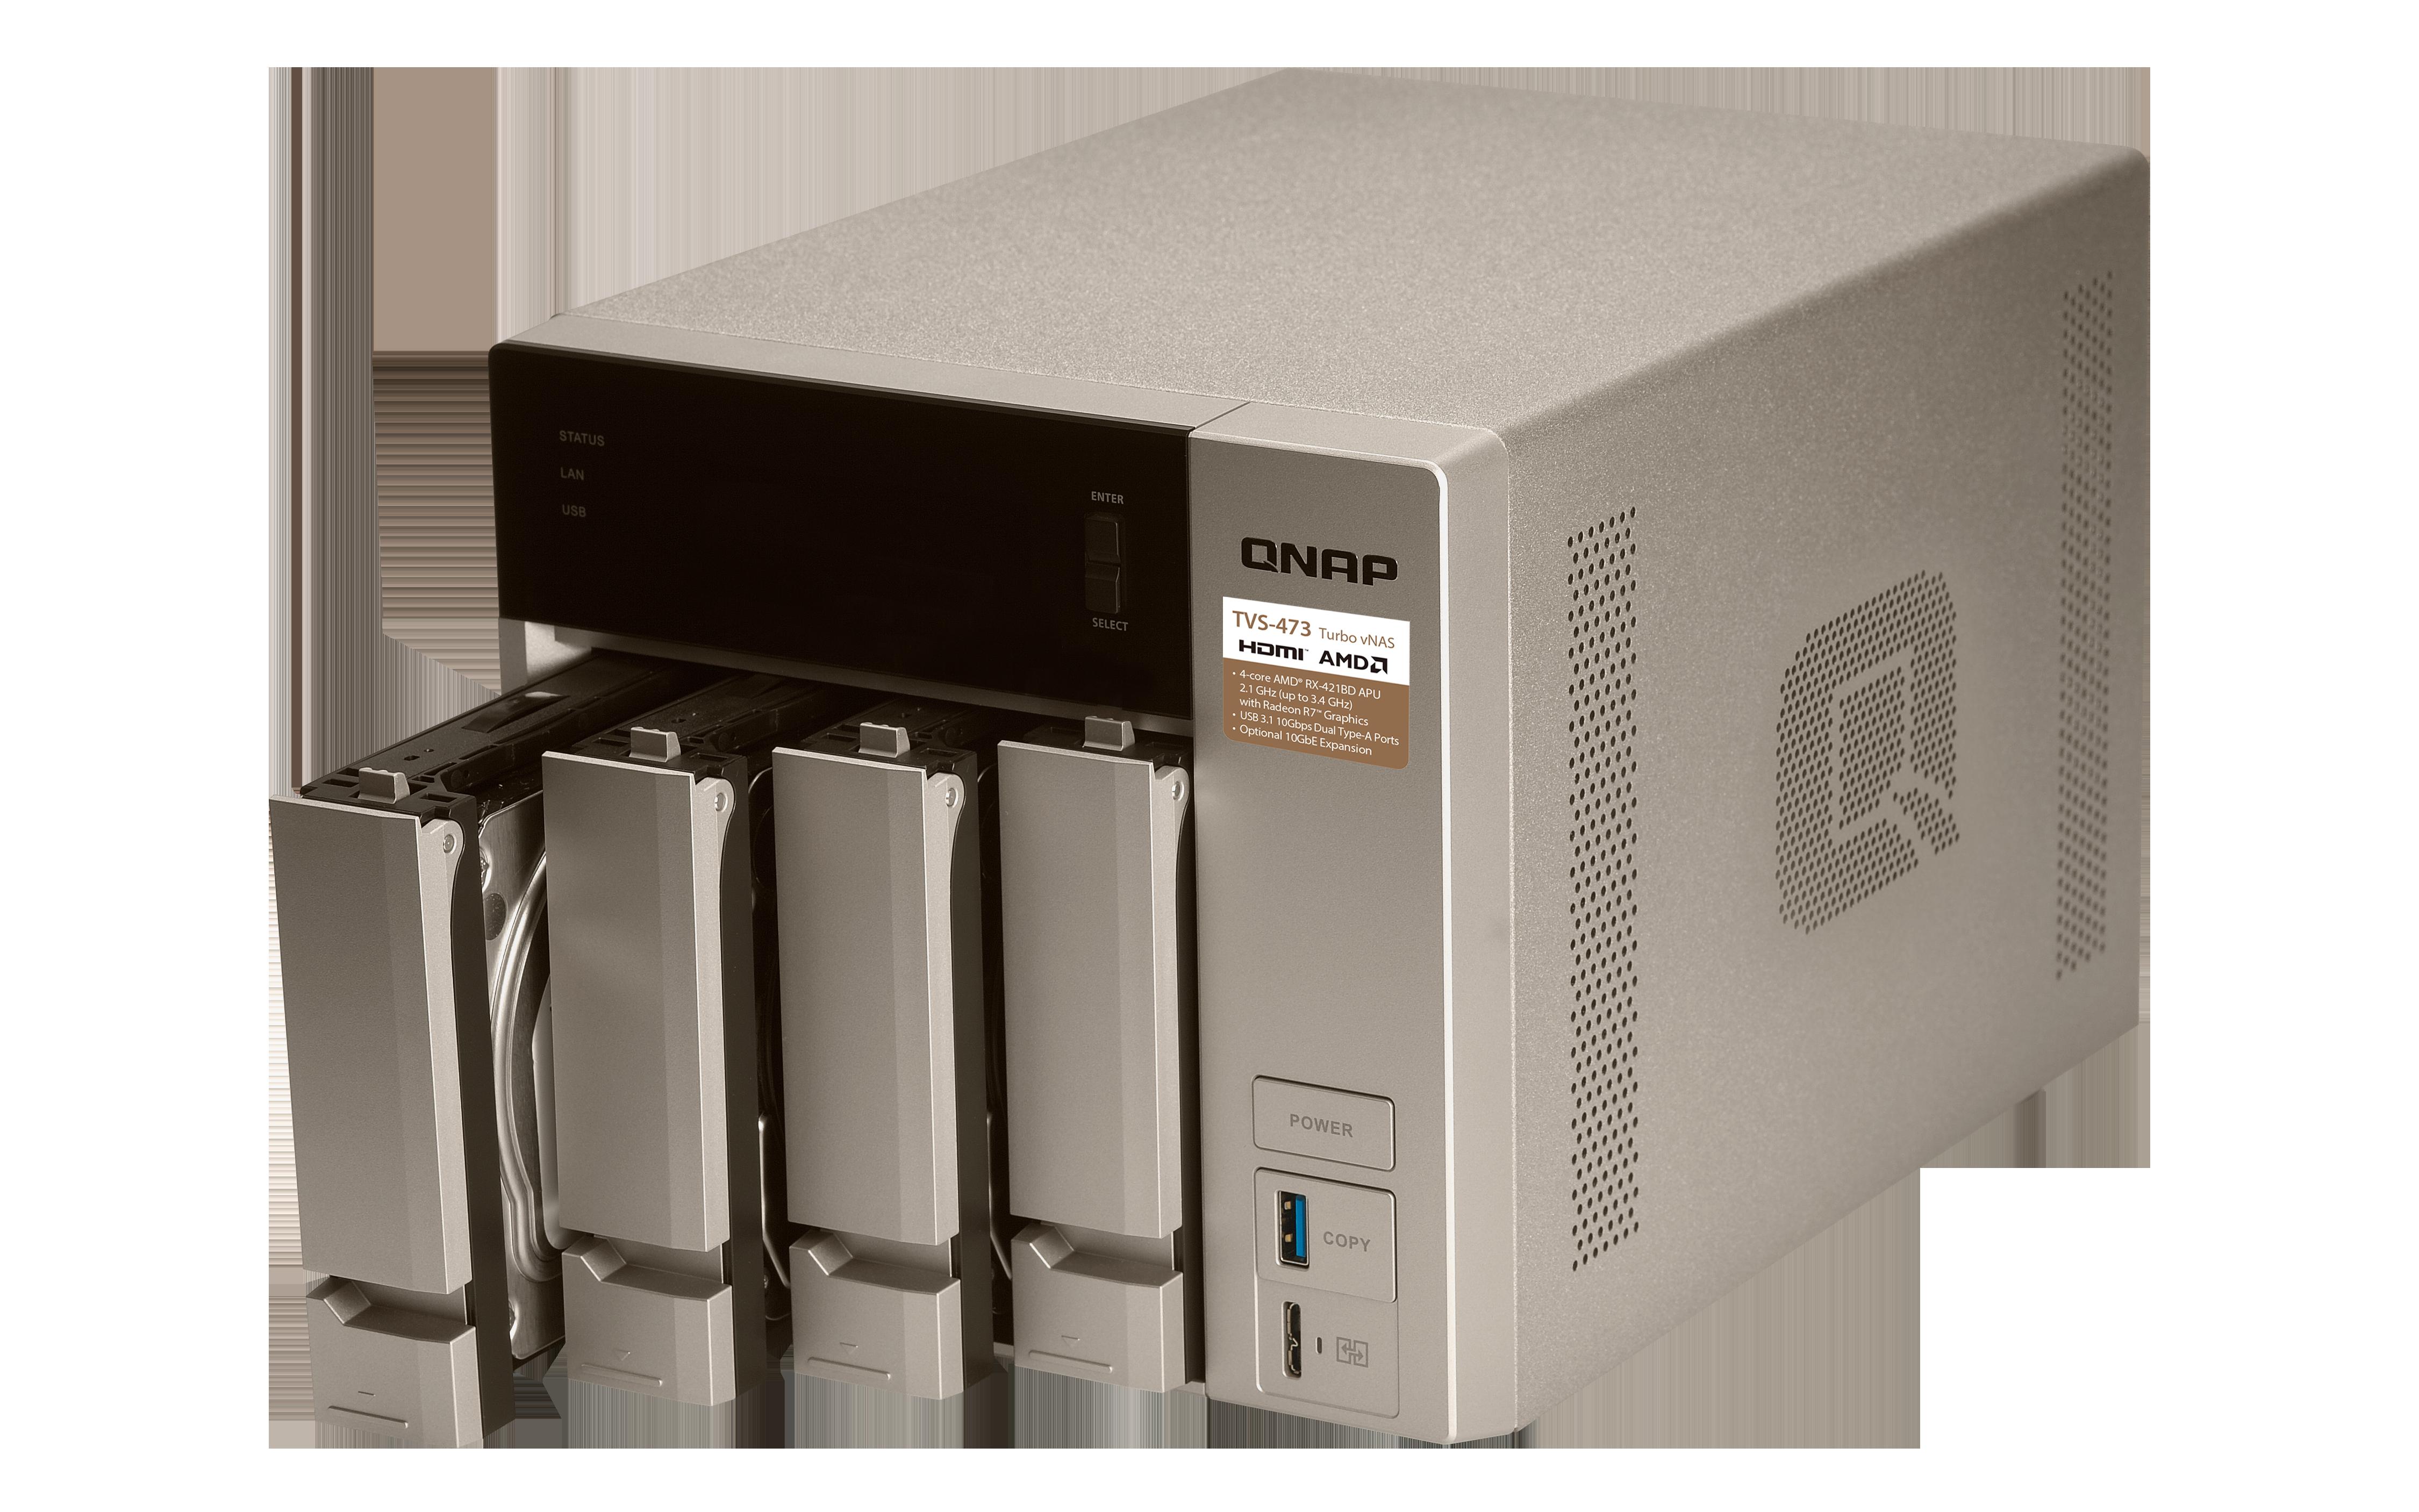 Qnap Tvs 473 8g 4 Bay Nas Desktop Bt Shop Ts 228 2 Server External Storage